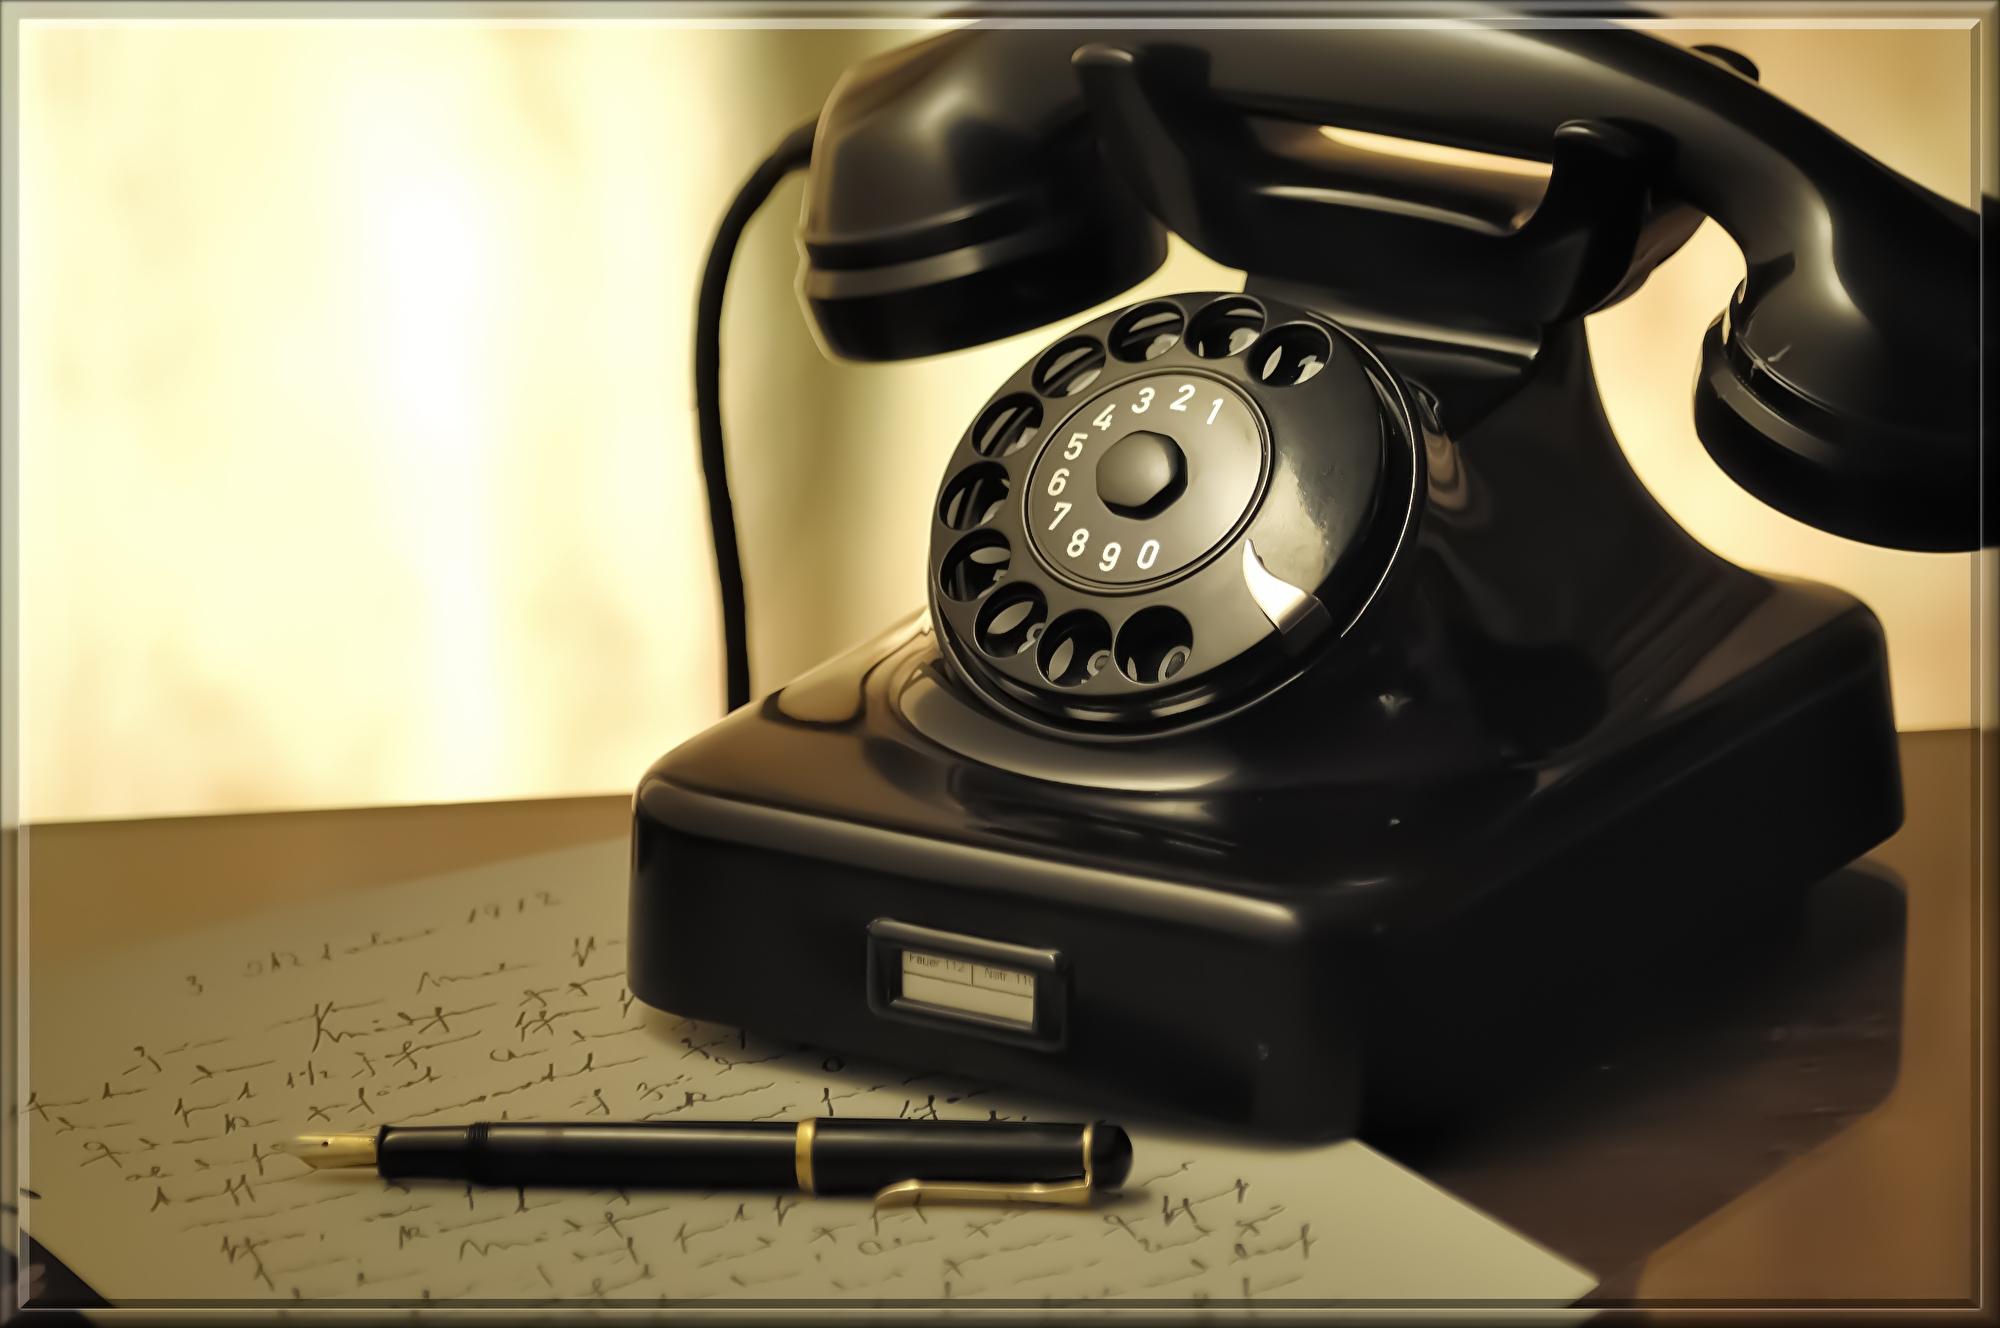 phone-499991.jpg